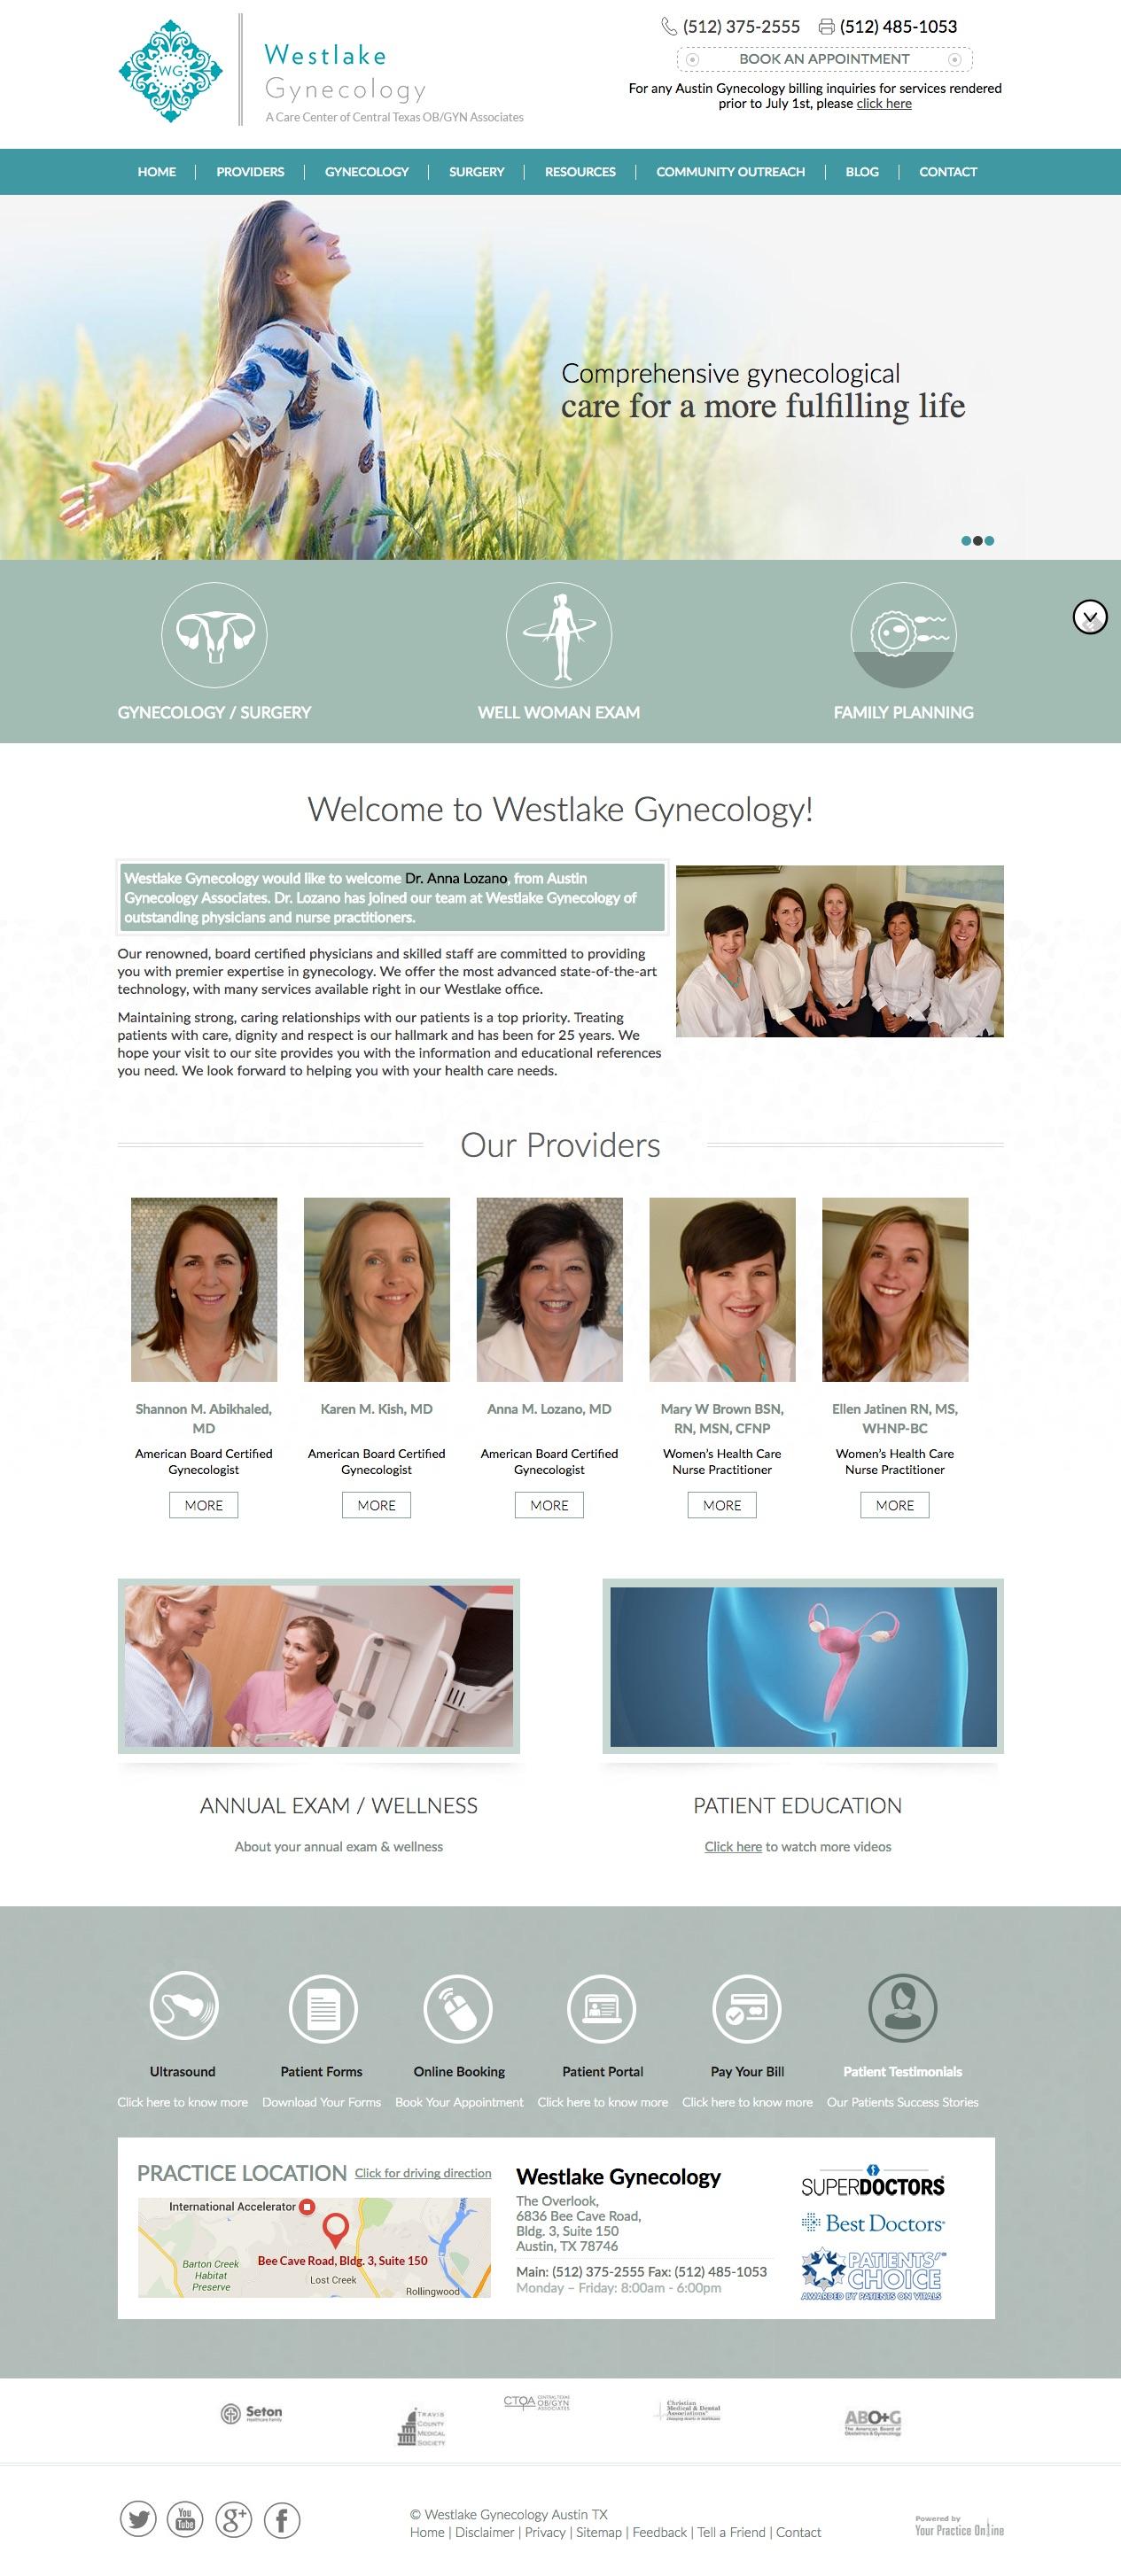 Westlake Gynecology Austin   Central Texas OB GYN Associates Austin  TX.jpg